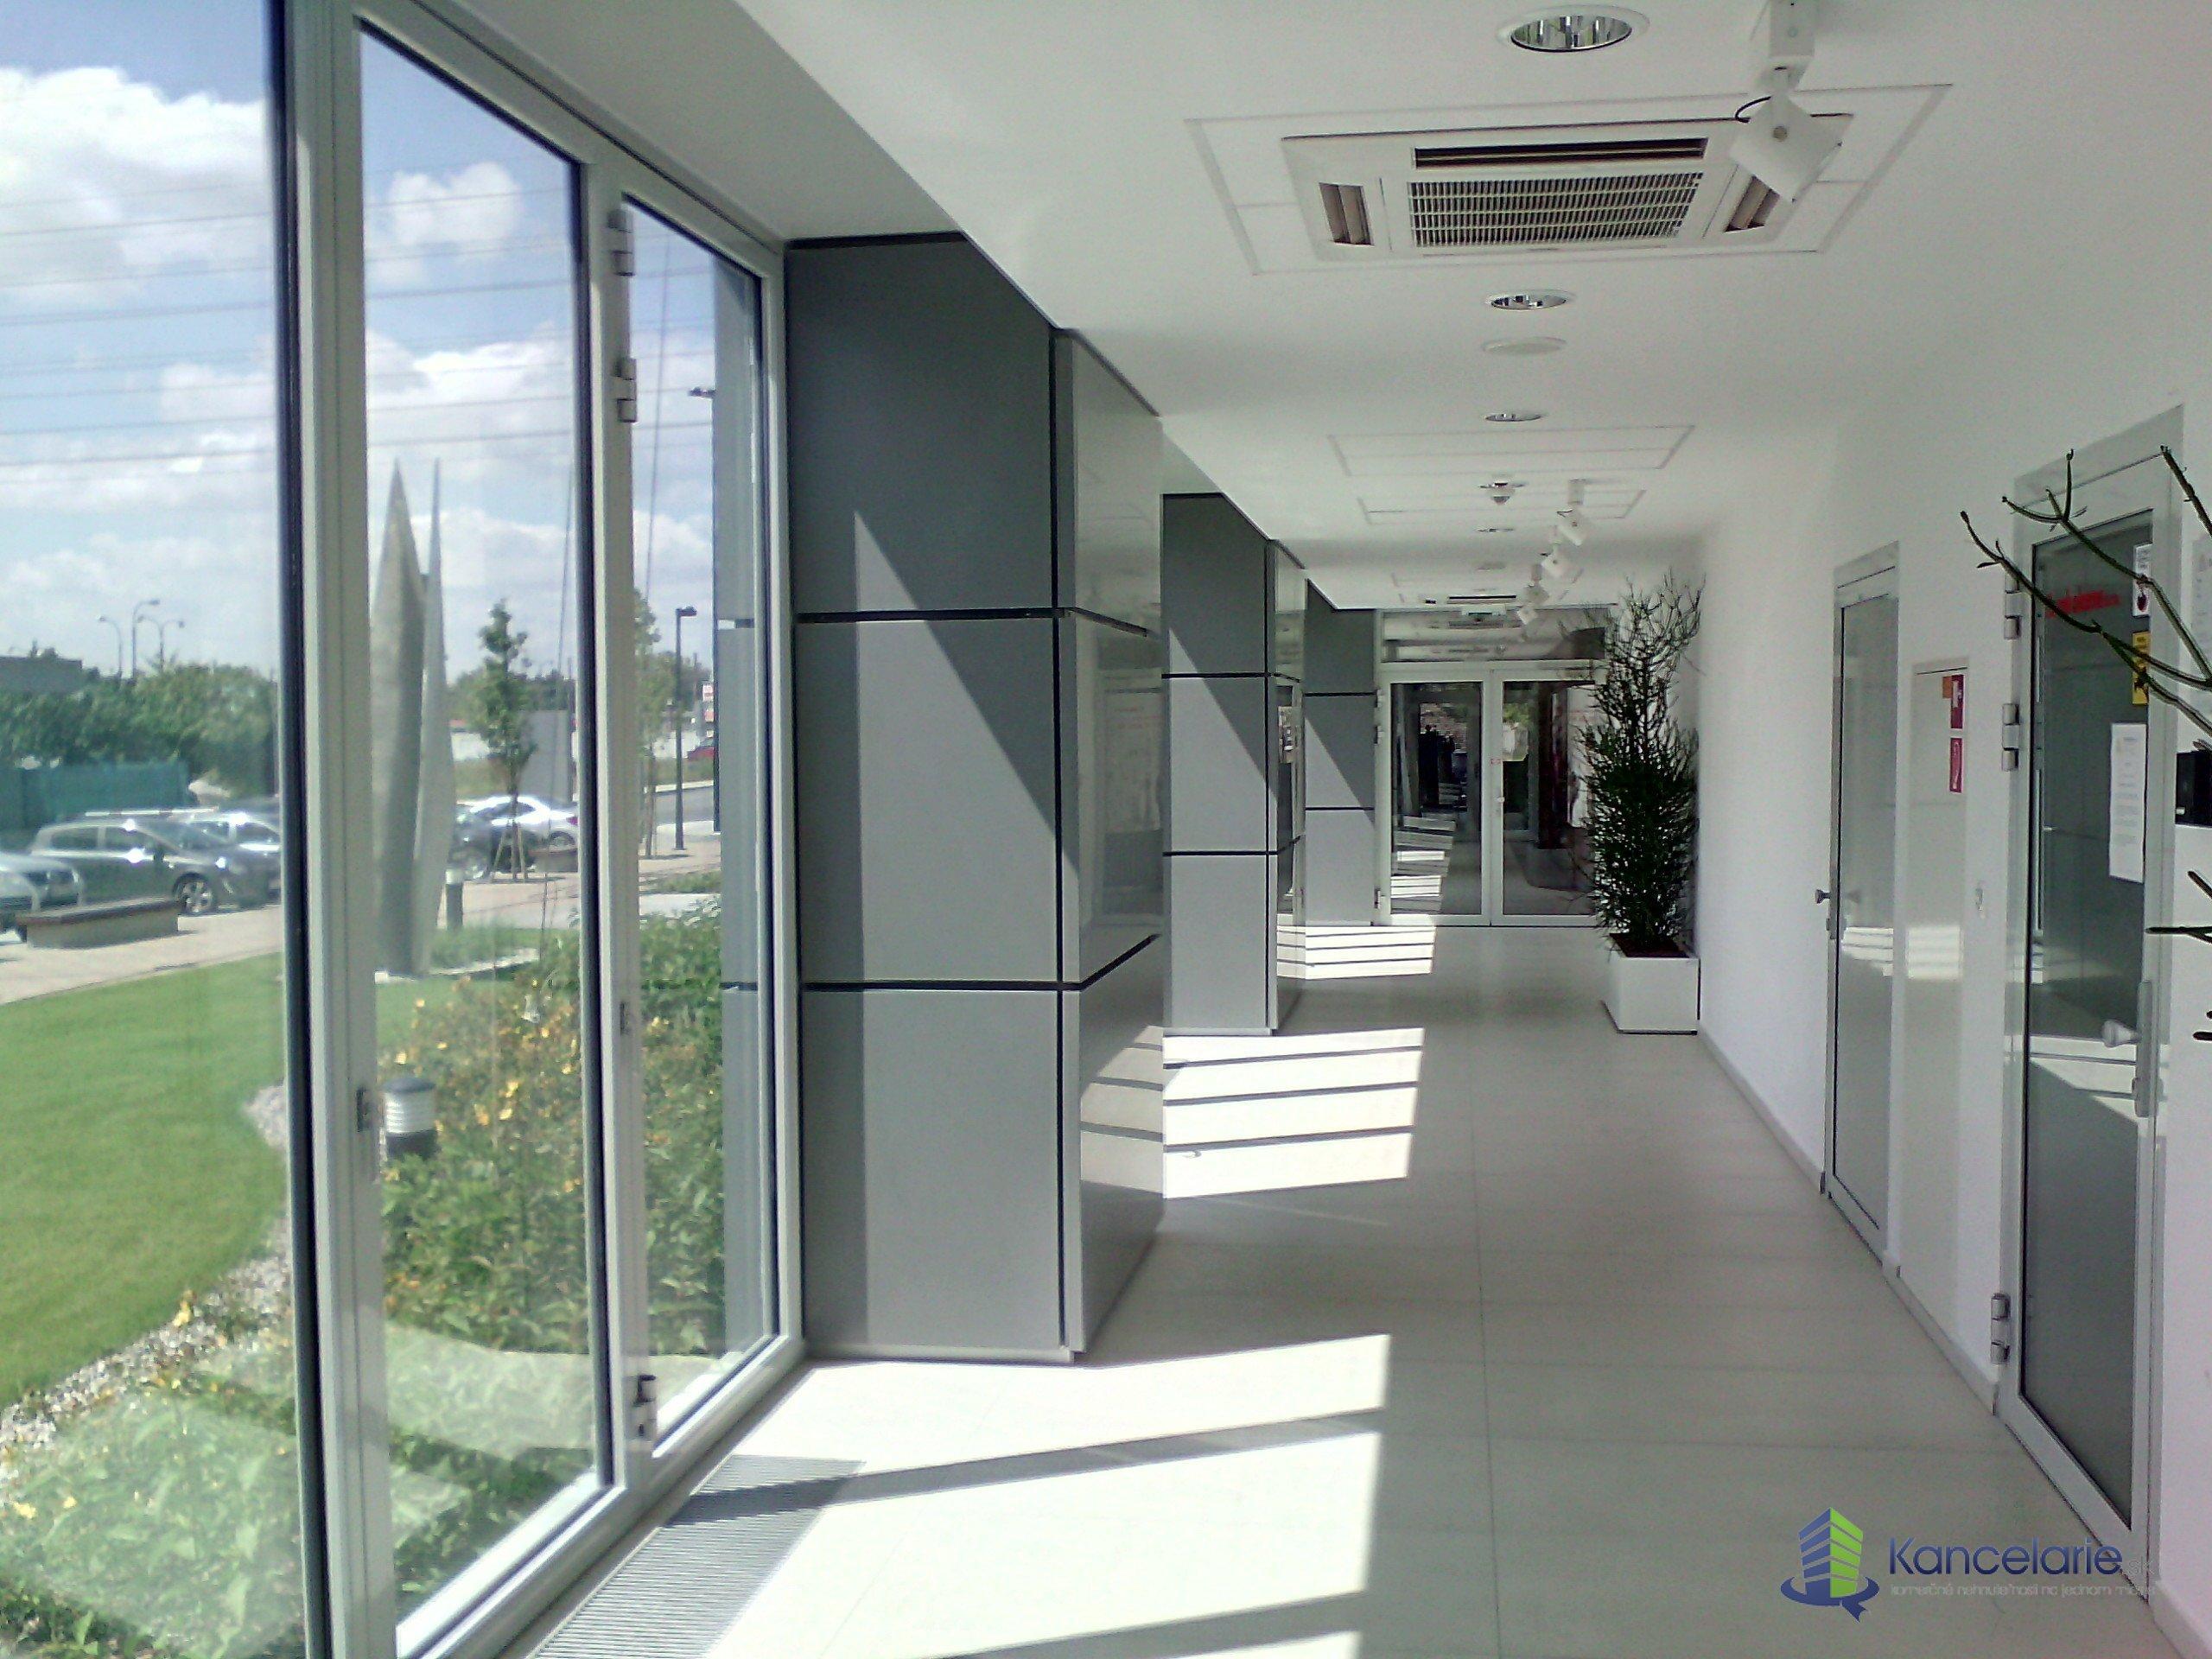 Matador Business Center / Hlavná budova, Admin. budova - 161,73 m2, Bojnická 3, Bratislava